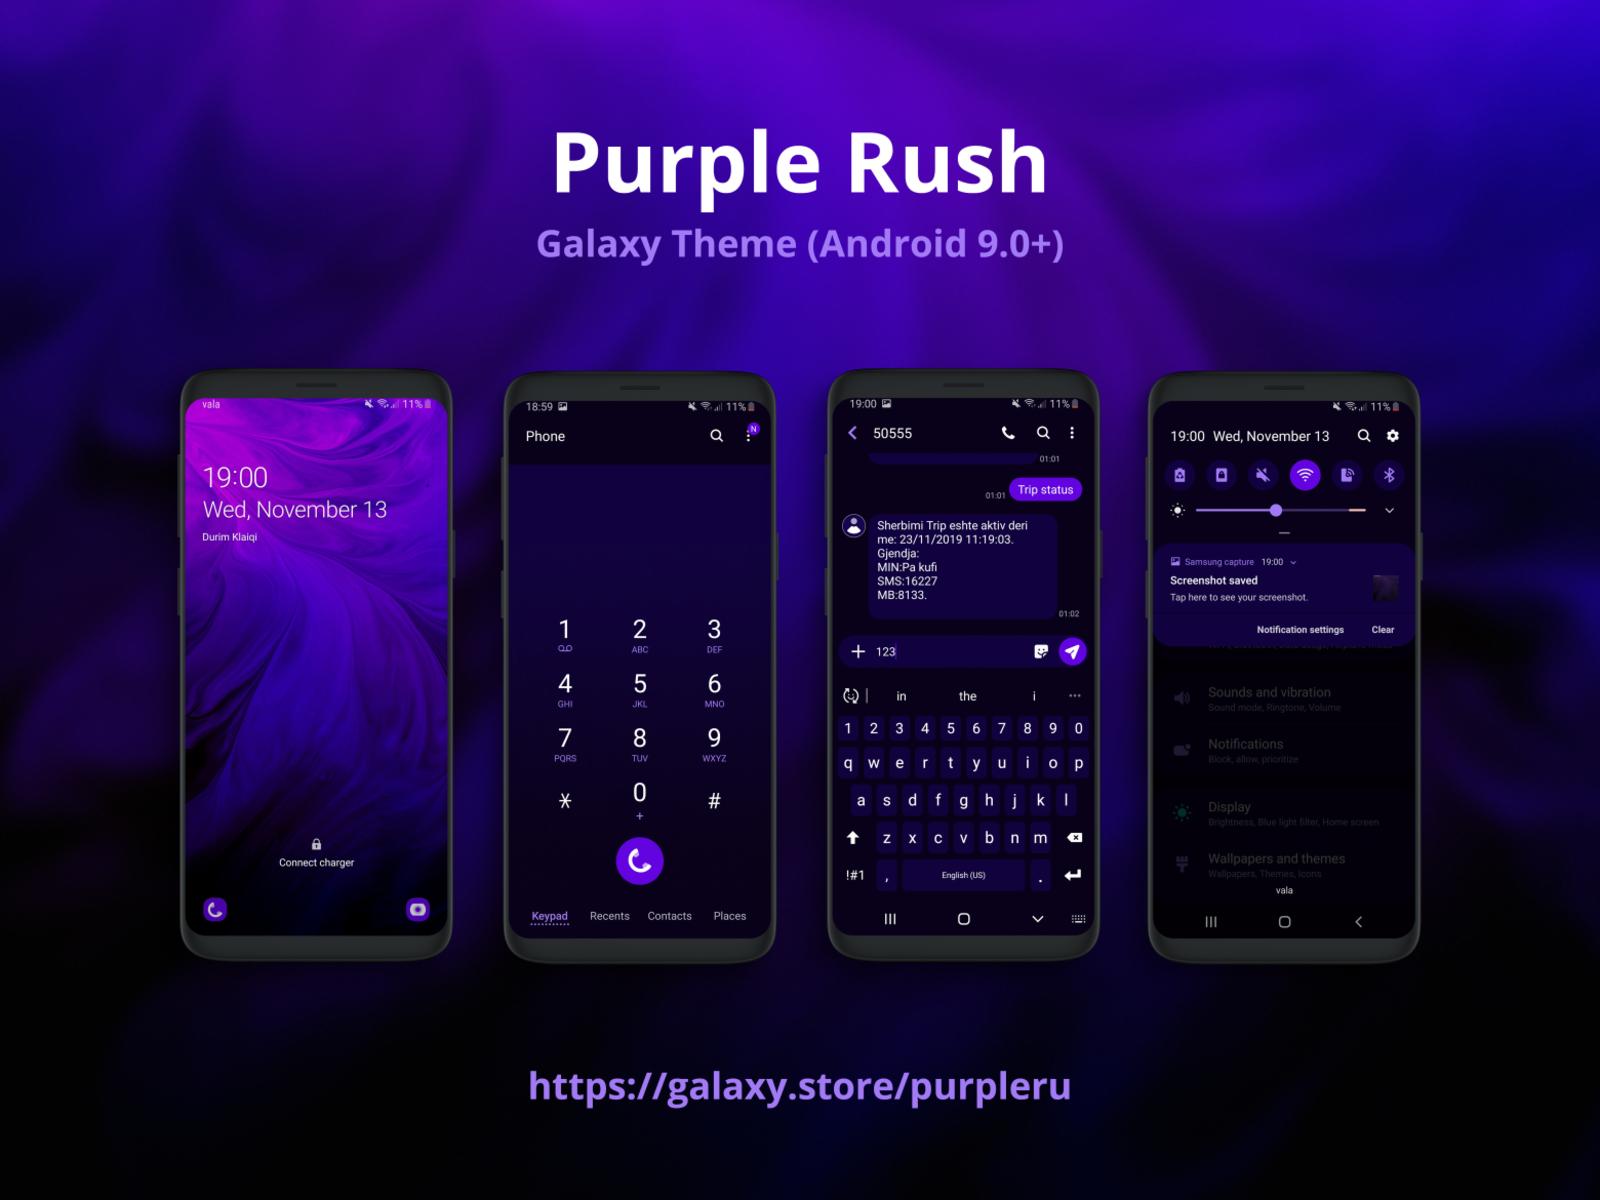 Purple Rush Samsung Galaxy Theme By Durim Klaiqi On Dribbble